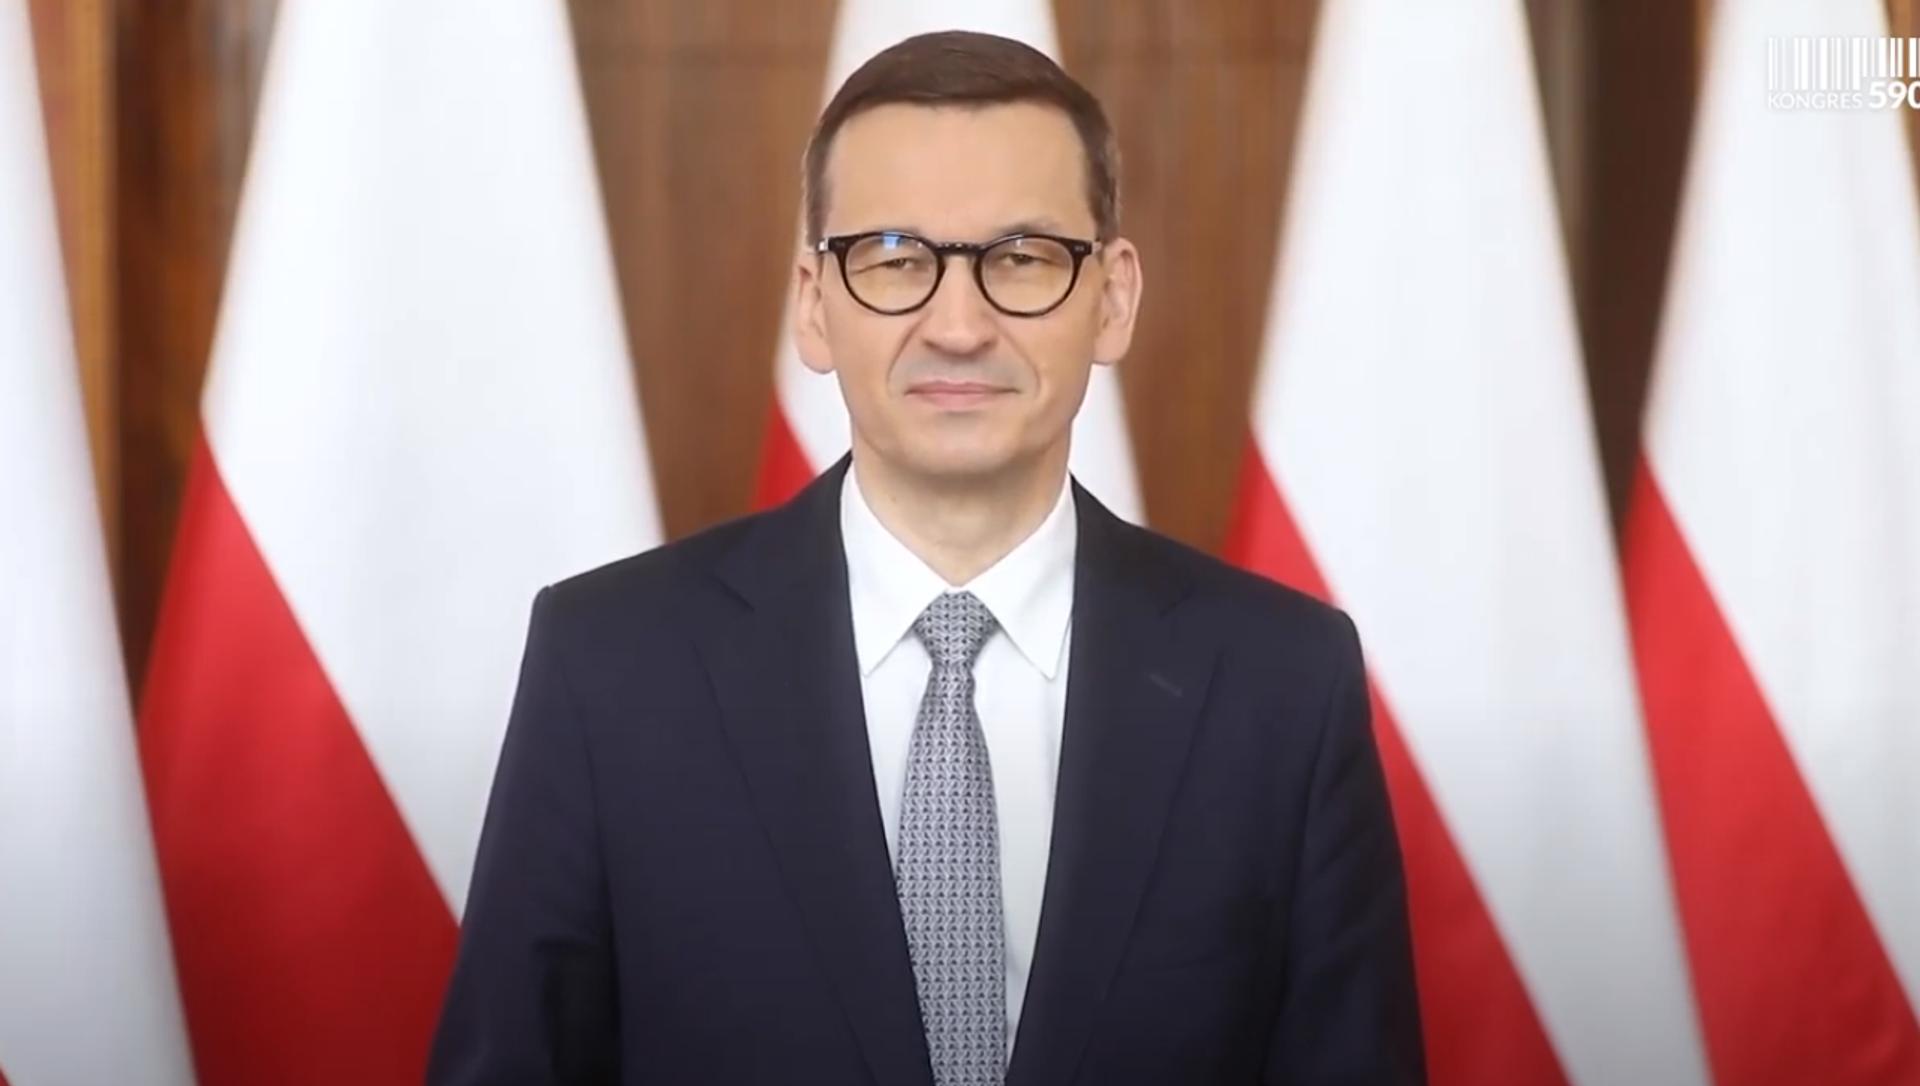 Premier Mateusz Morawiecki - Sputnik Polska, 1920, 07.05.2021